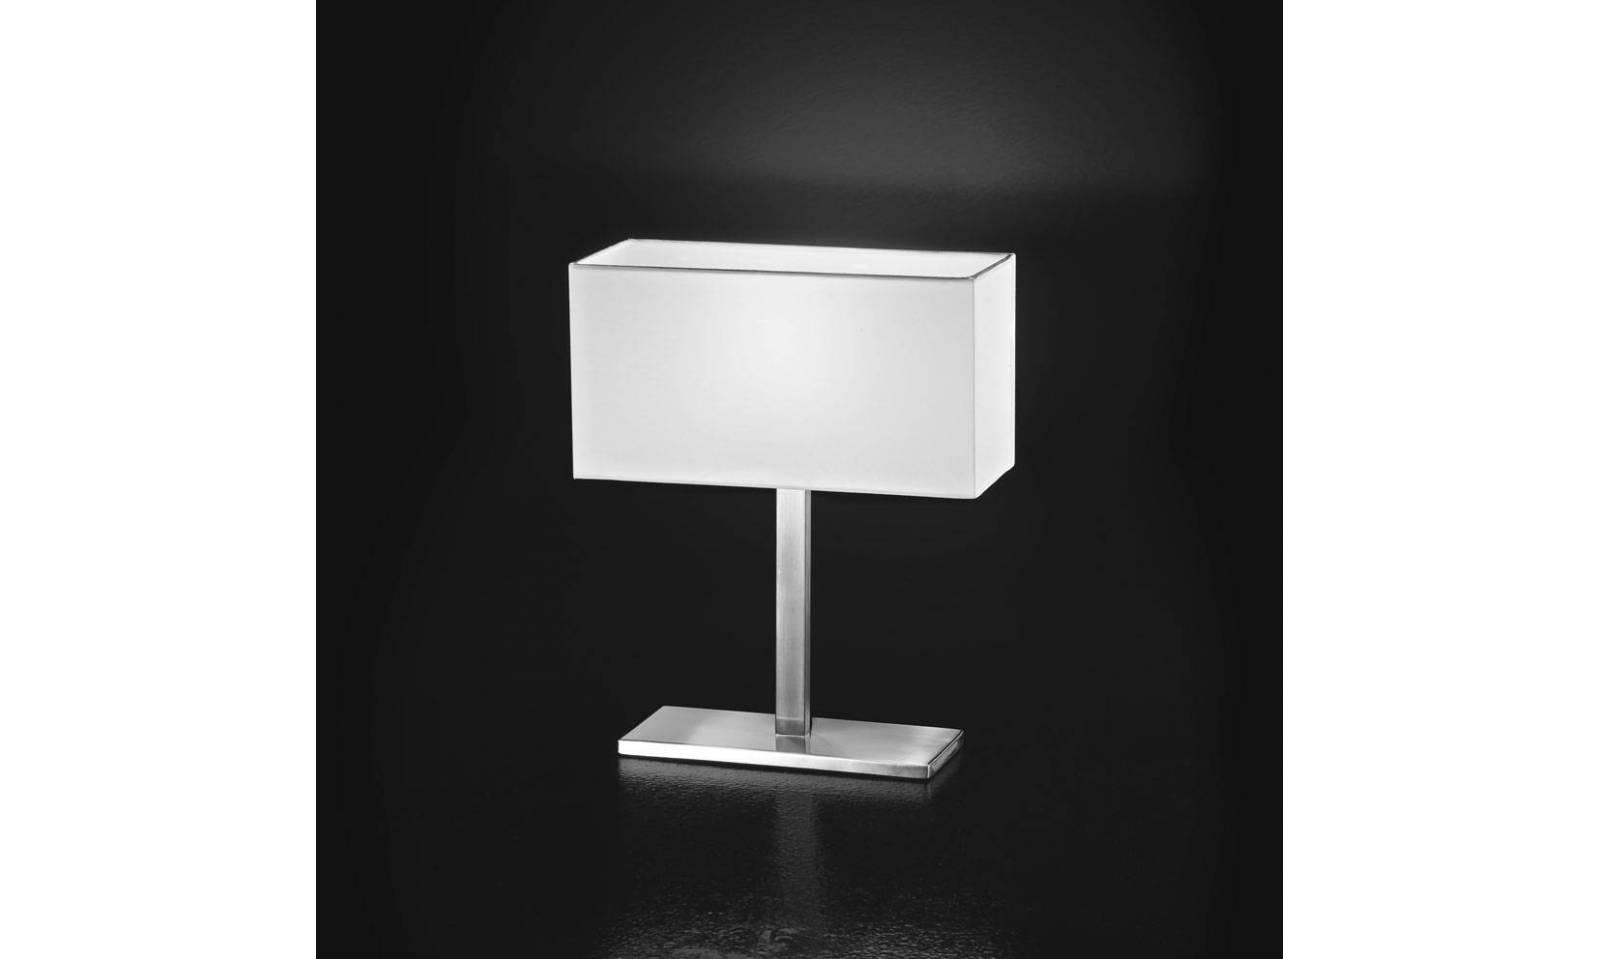 Perenz lampada da tavolo moderna in cromo spazzolato serie 5884 - Lampada da tavolo moderna ...